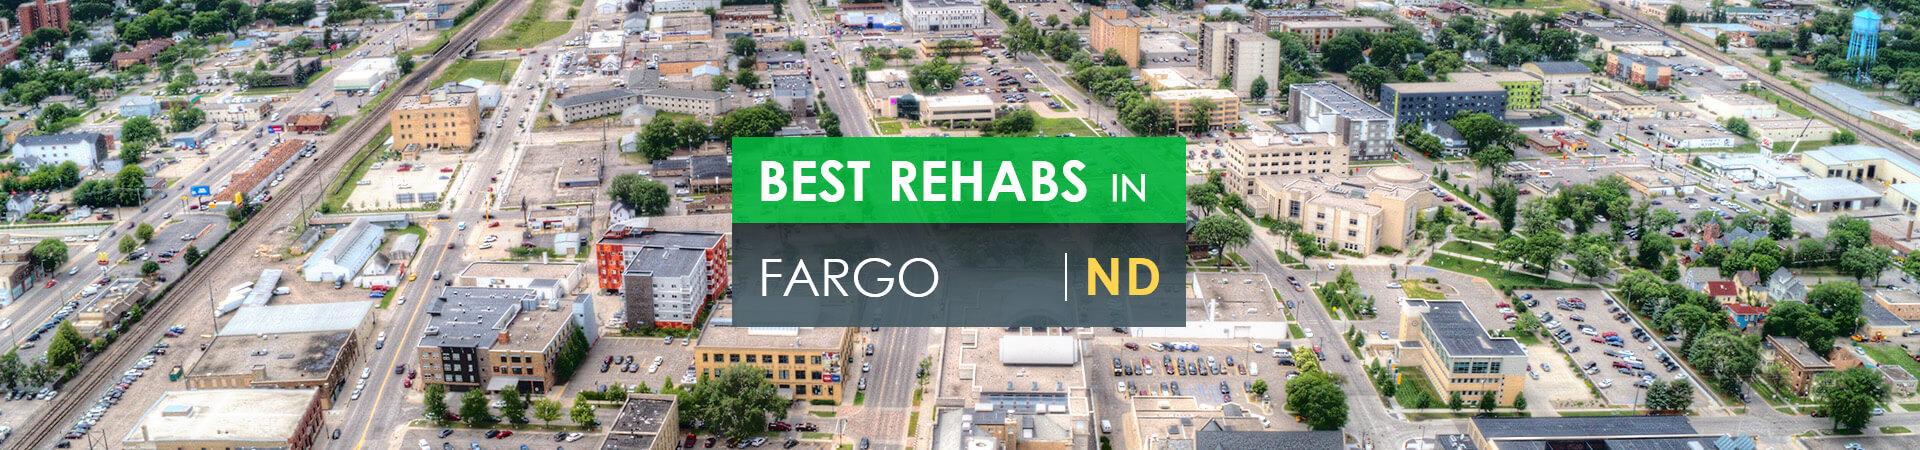 Best rehabs in Fargo, ND